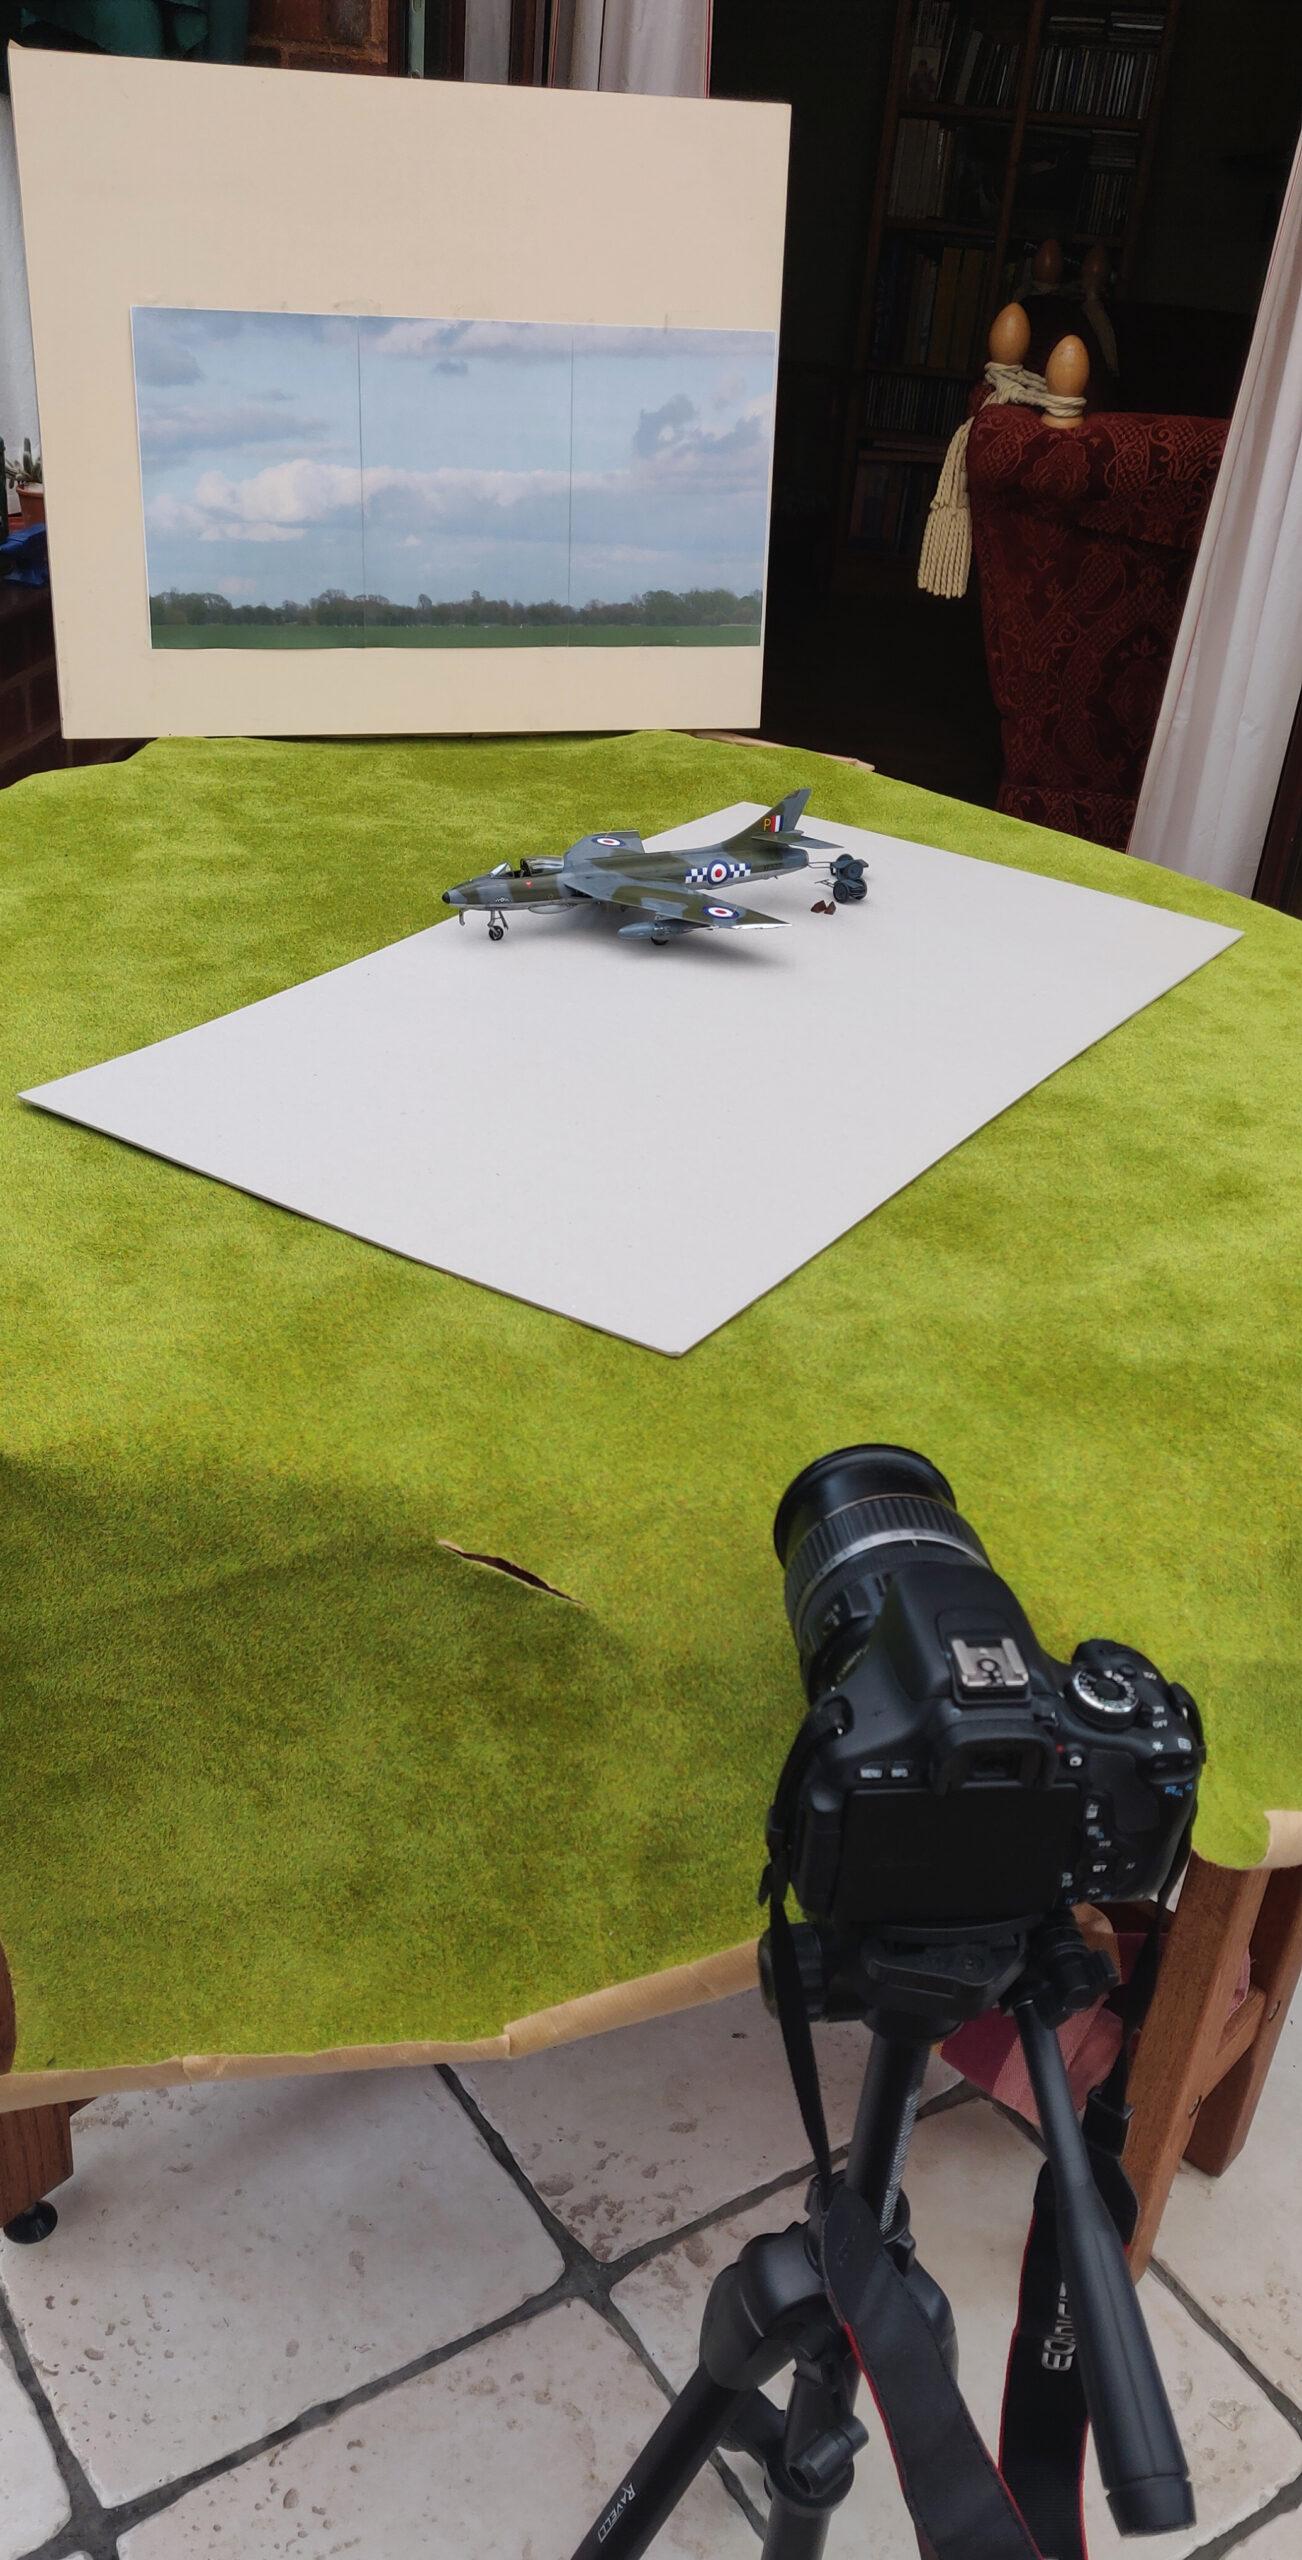 Hawker Hunter F.6 1/48th scale photo shoot setup